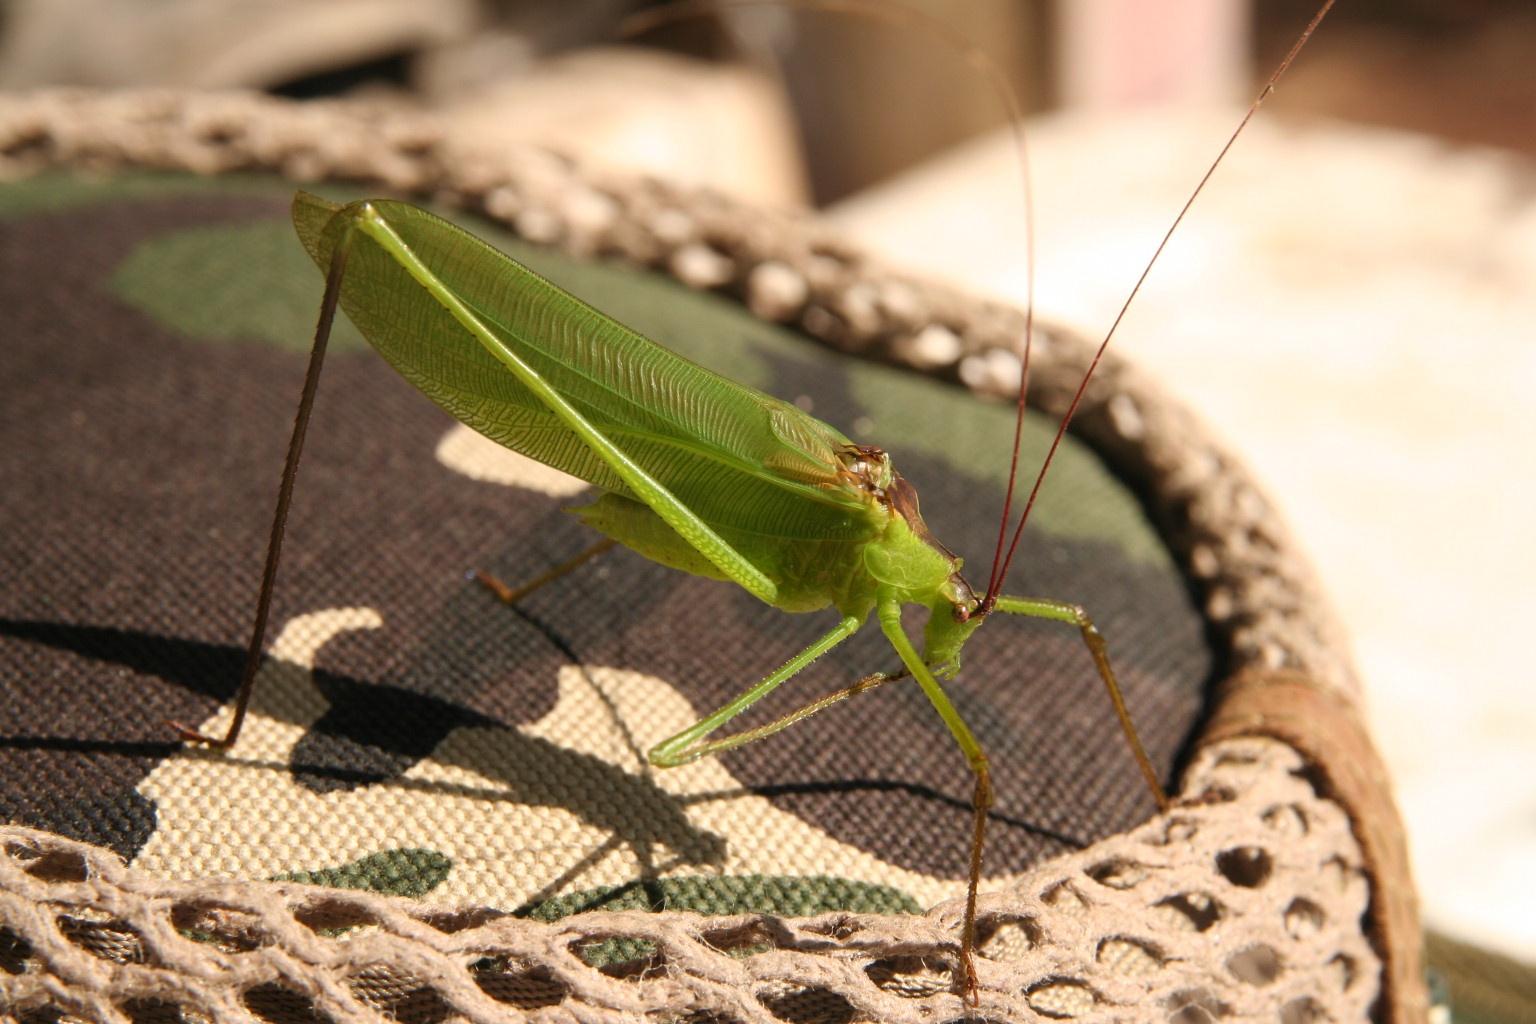 A giant grasshopper